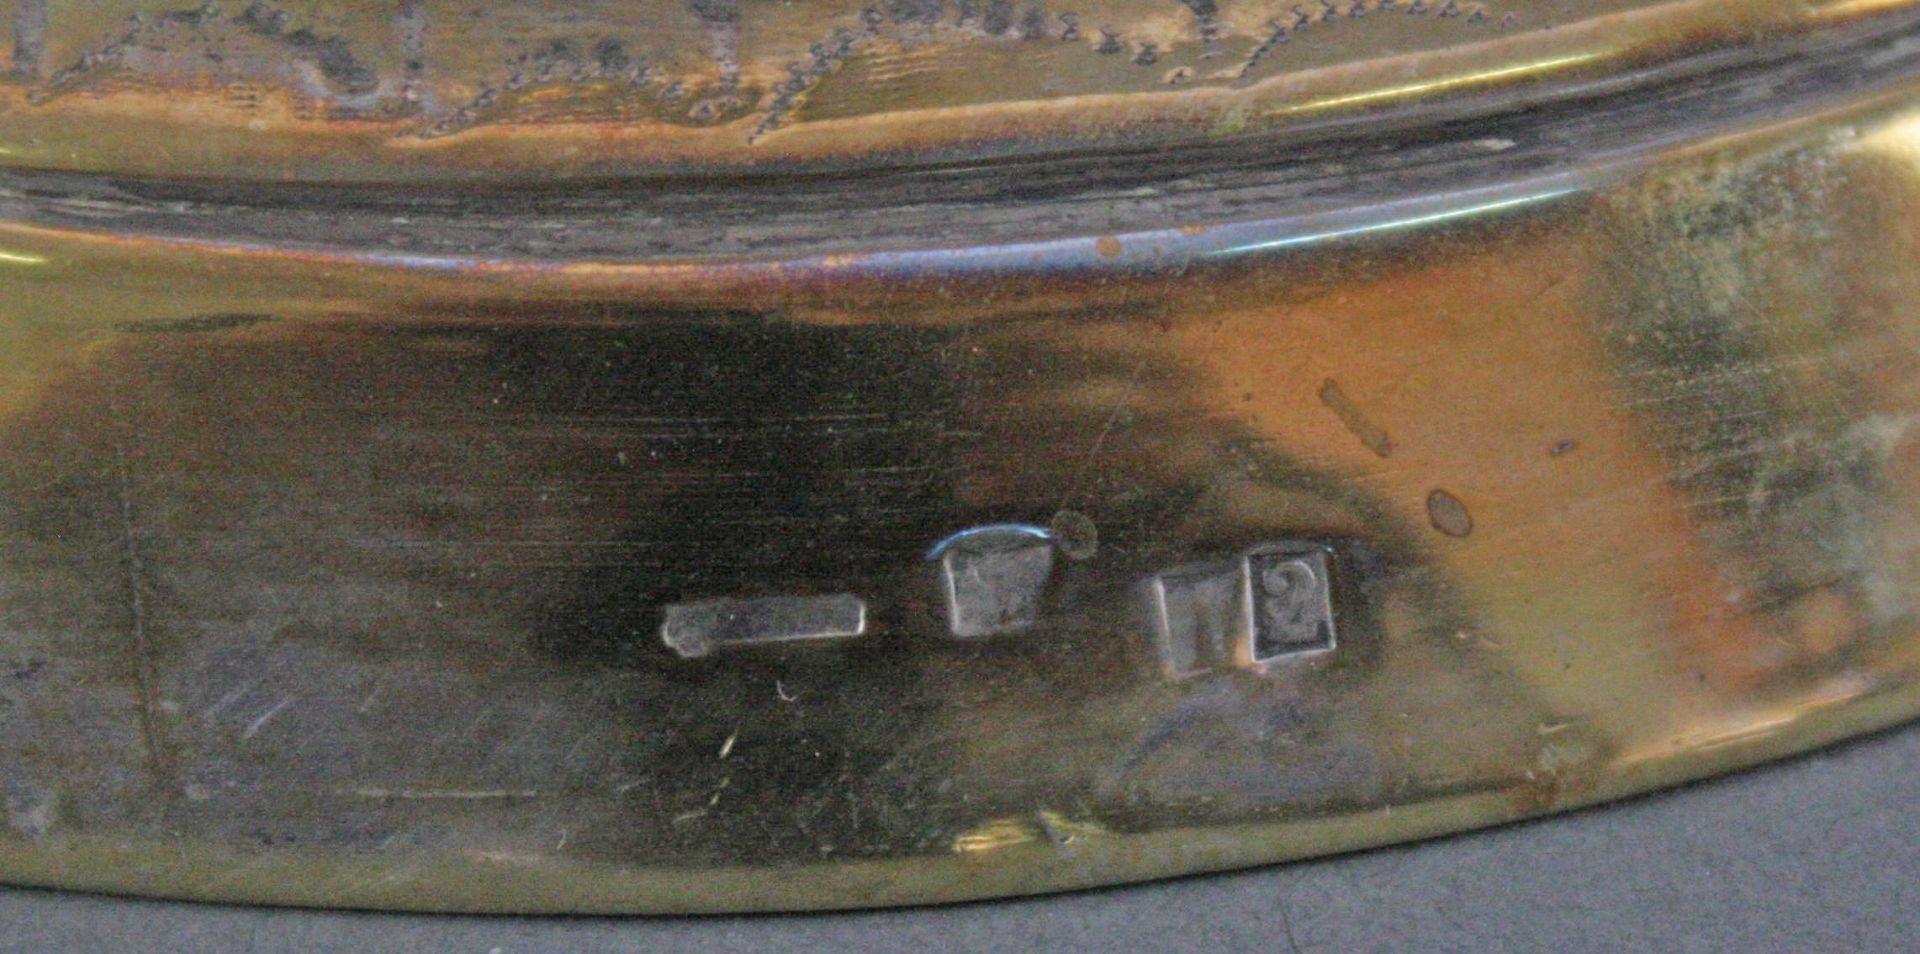 Kerzenhalter versilbert und vergoldet, 19. Jahrhundert - Bild 4 aus 5